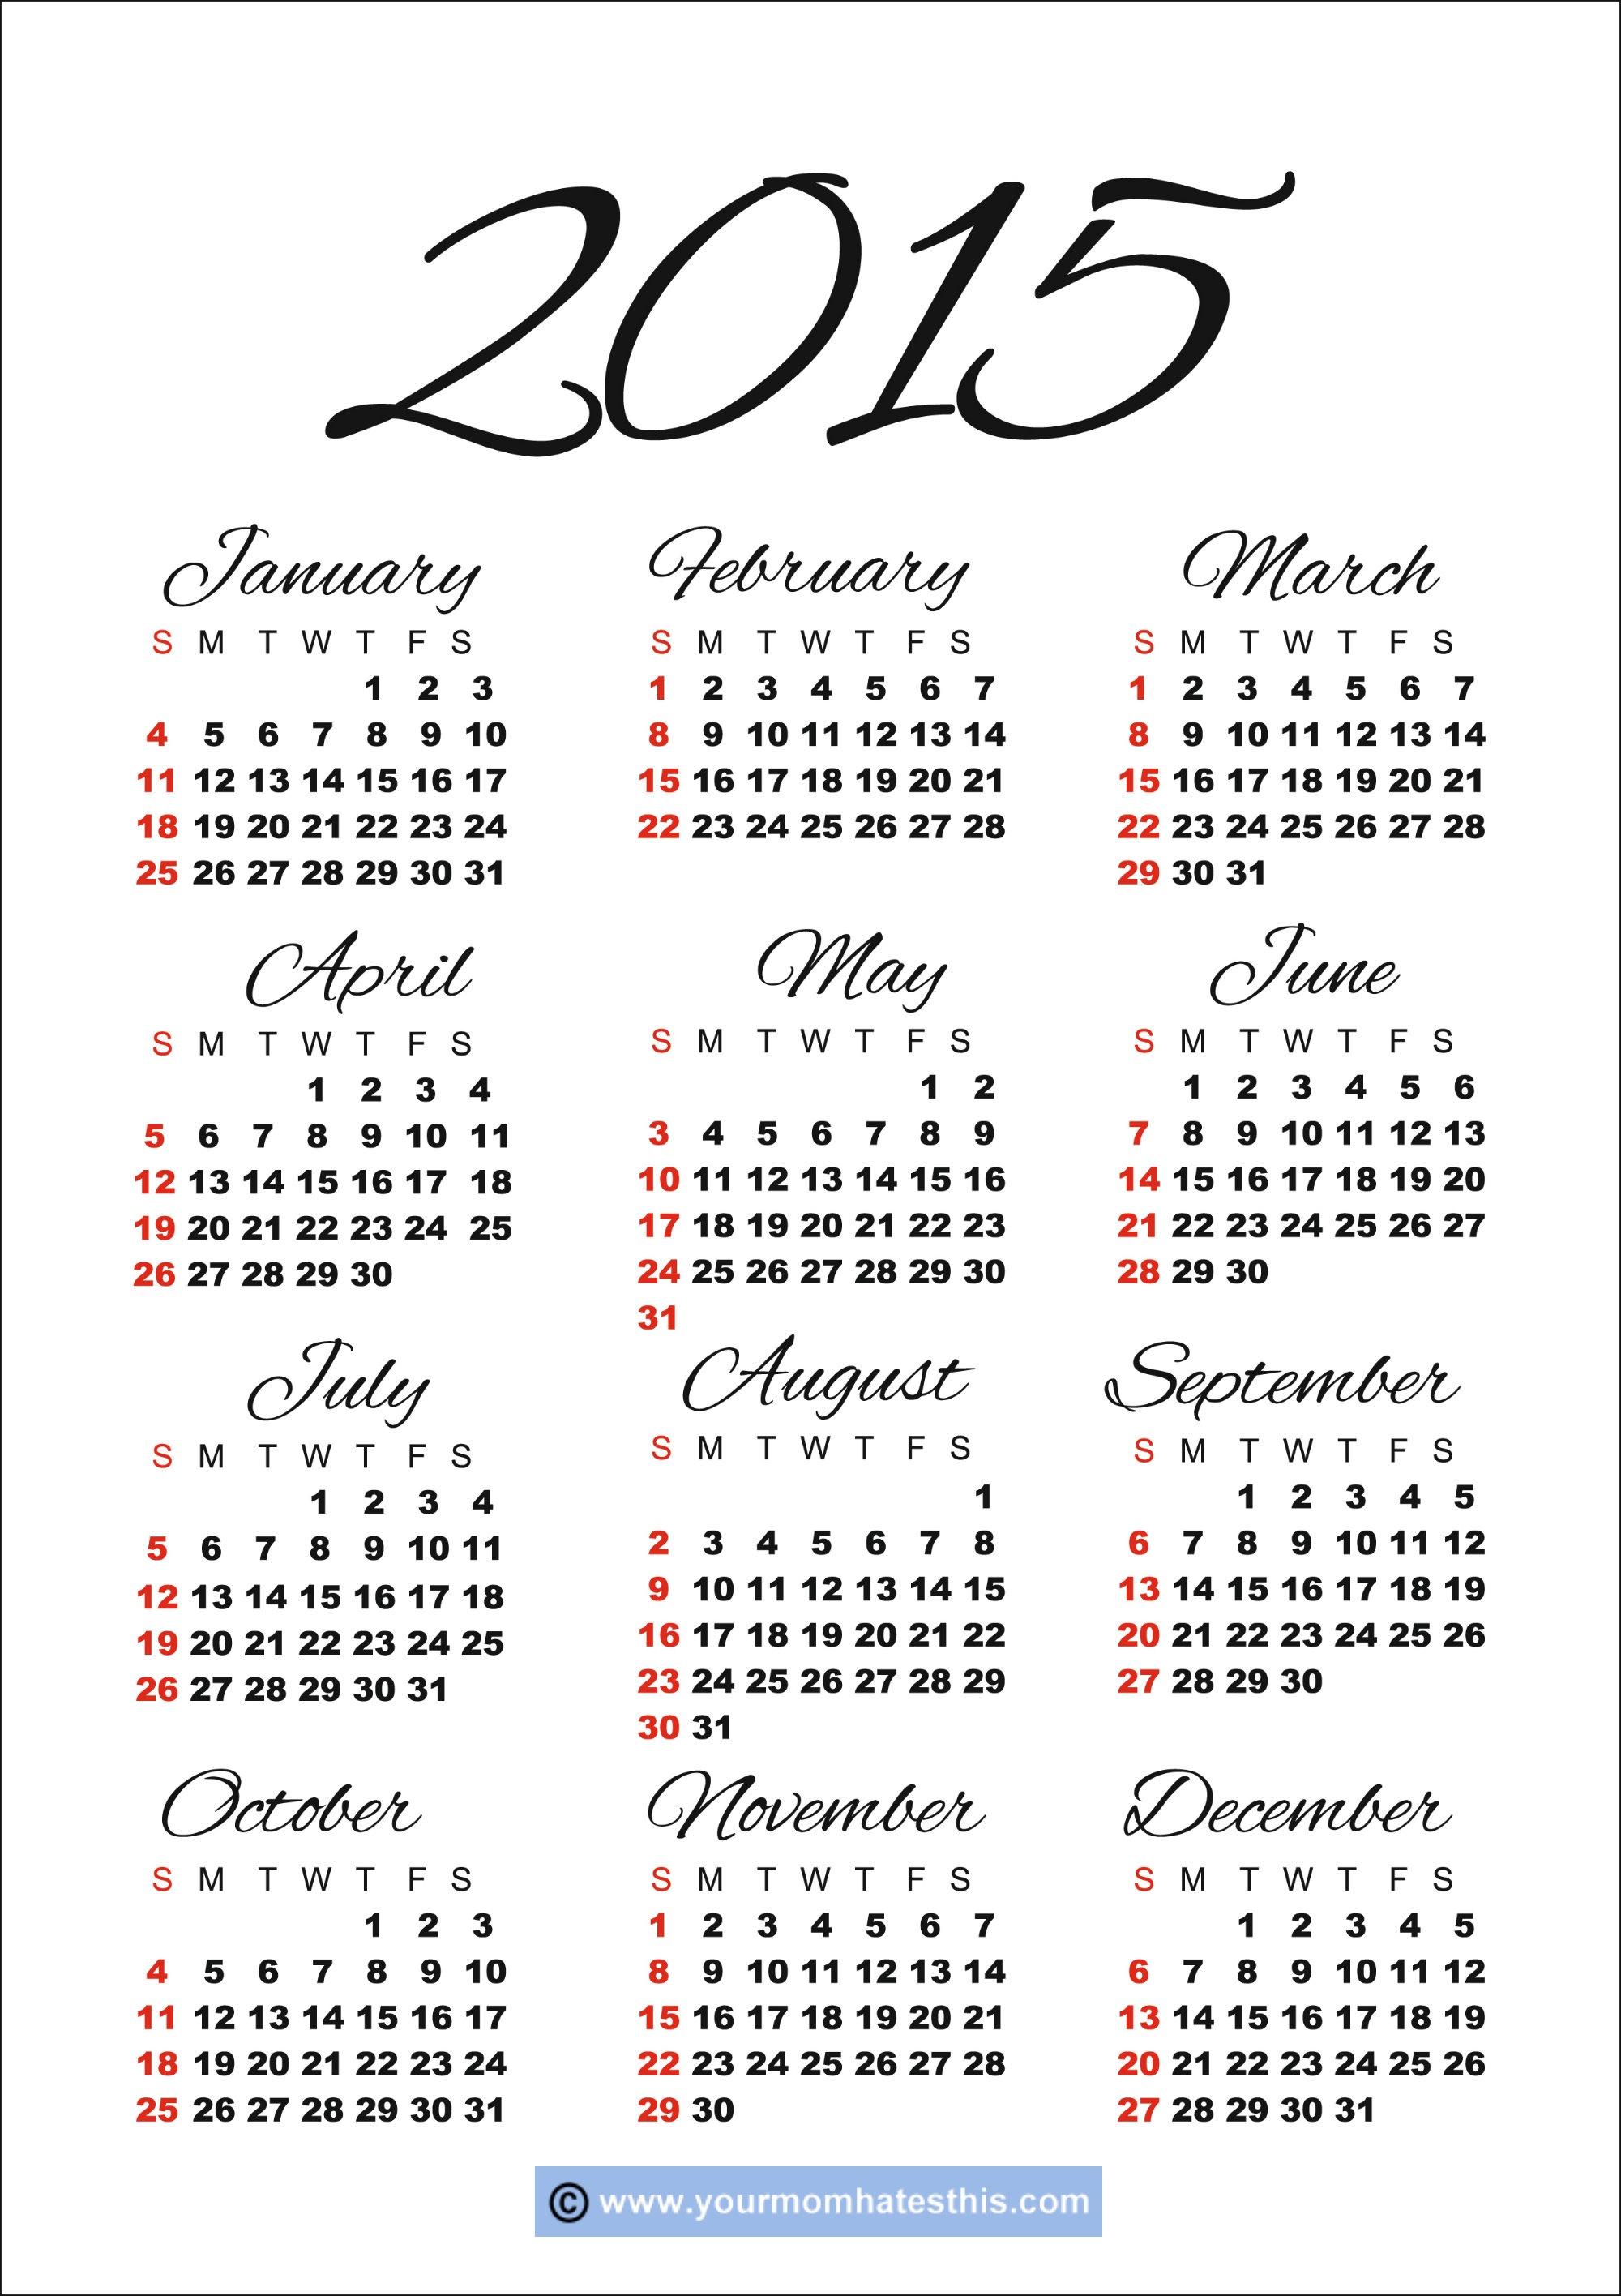 2015 Calendar Templates & Images - Free Printable Diary 2015